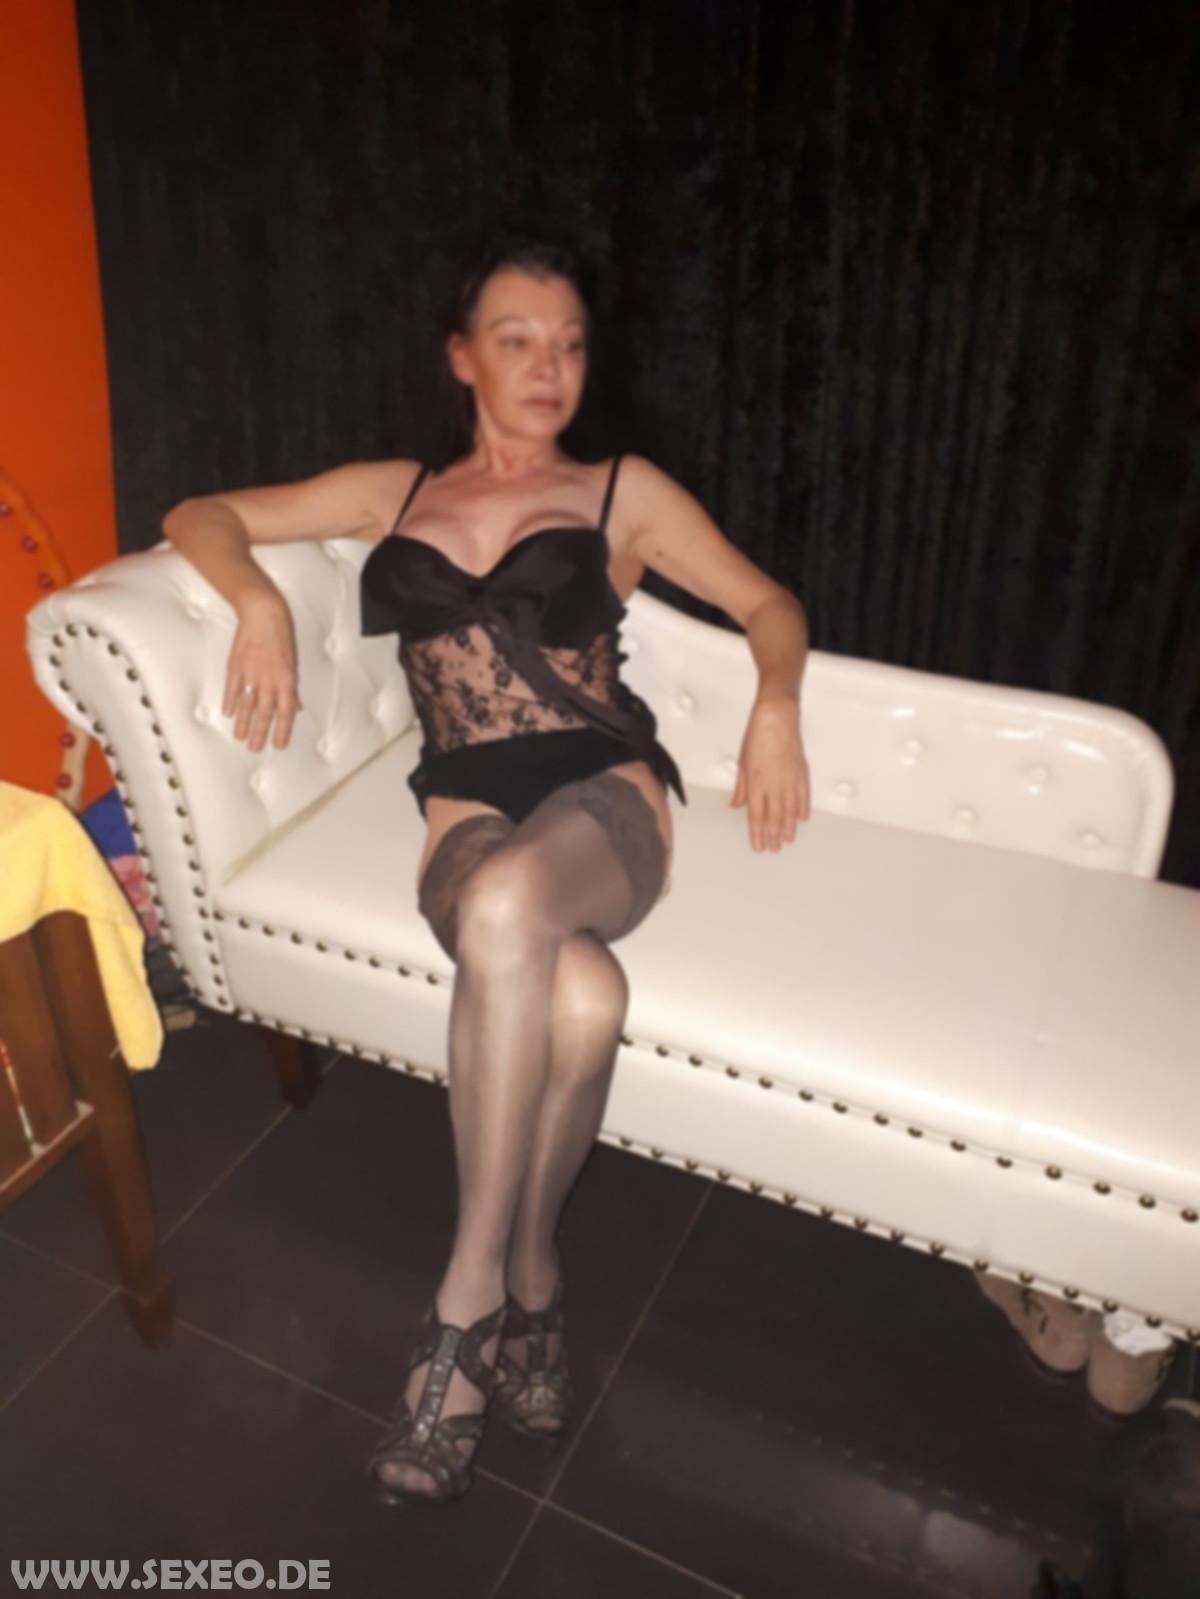 Mellie-NS-&-KV-Queen_1582123312291